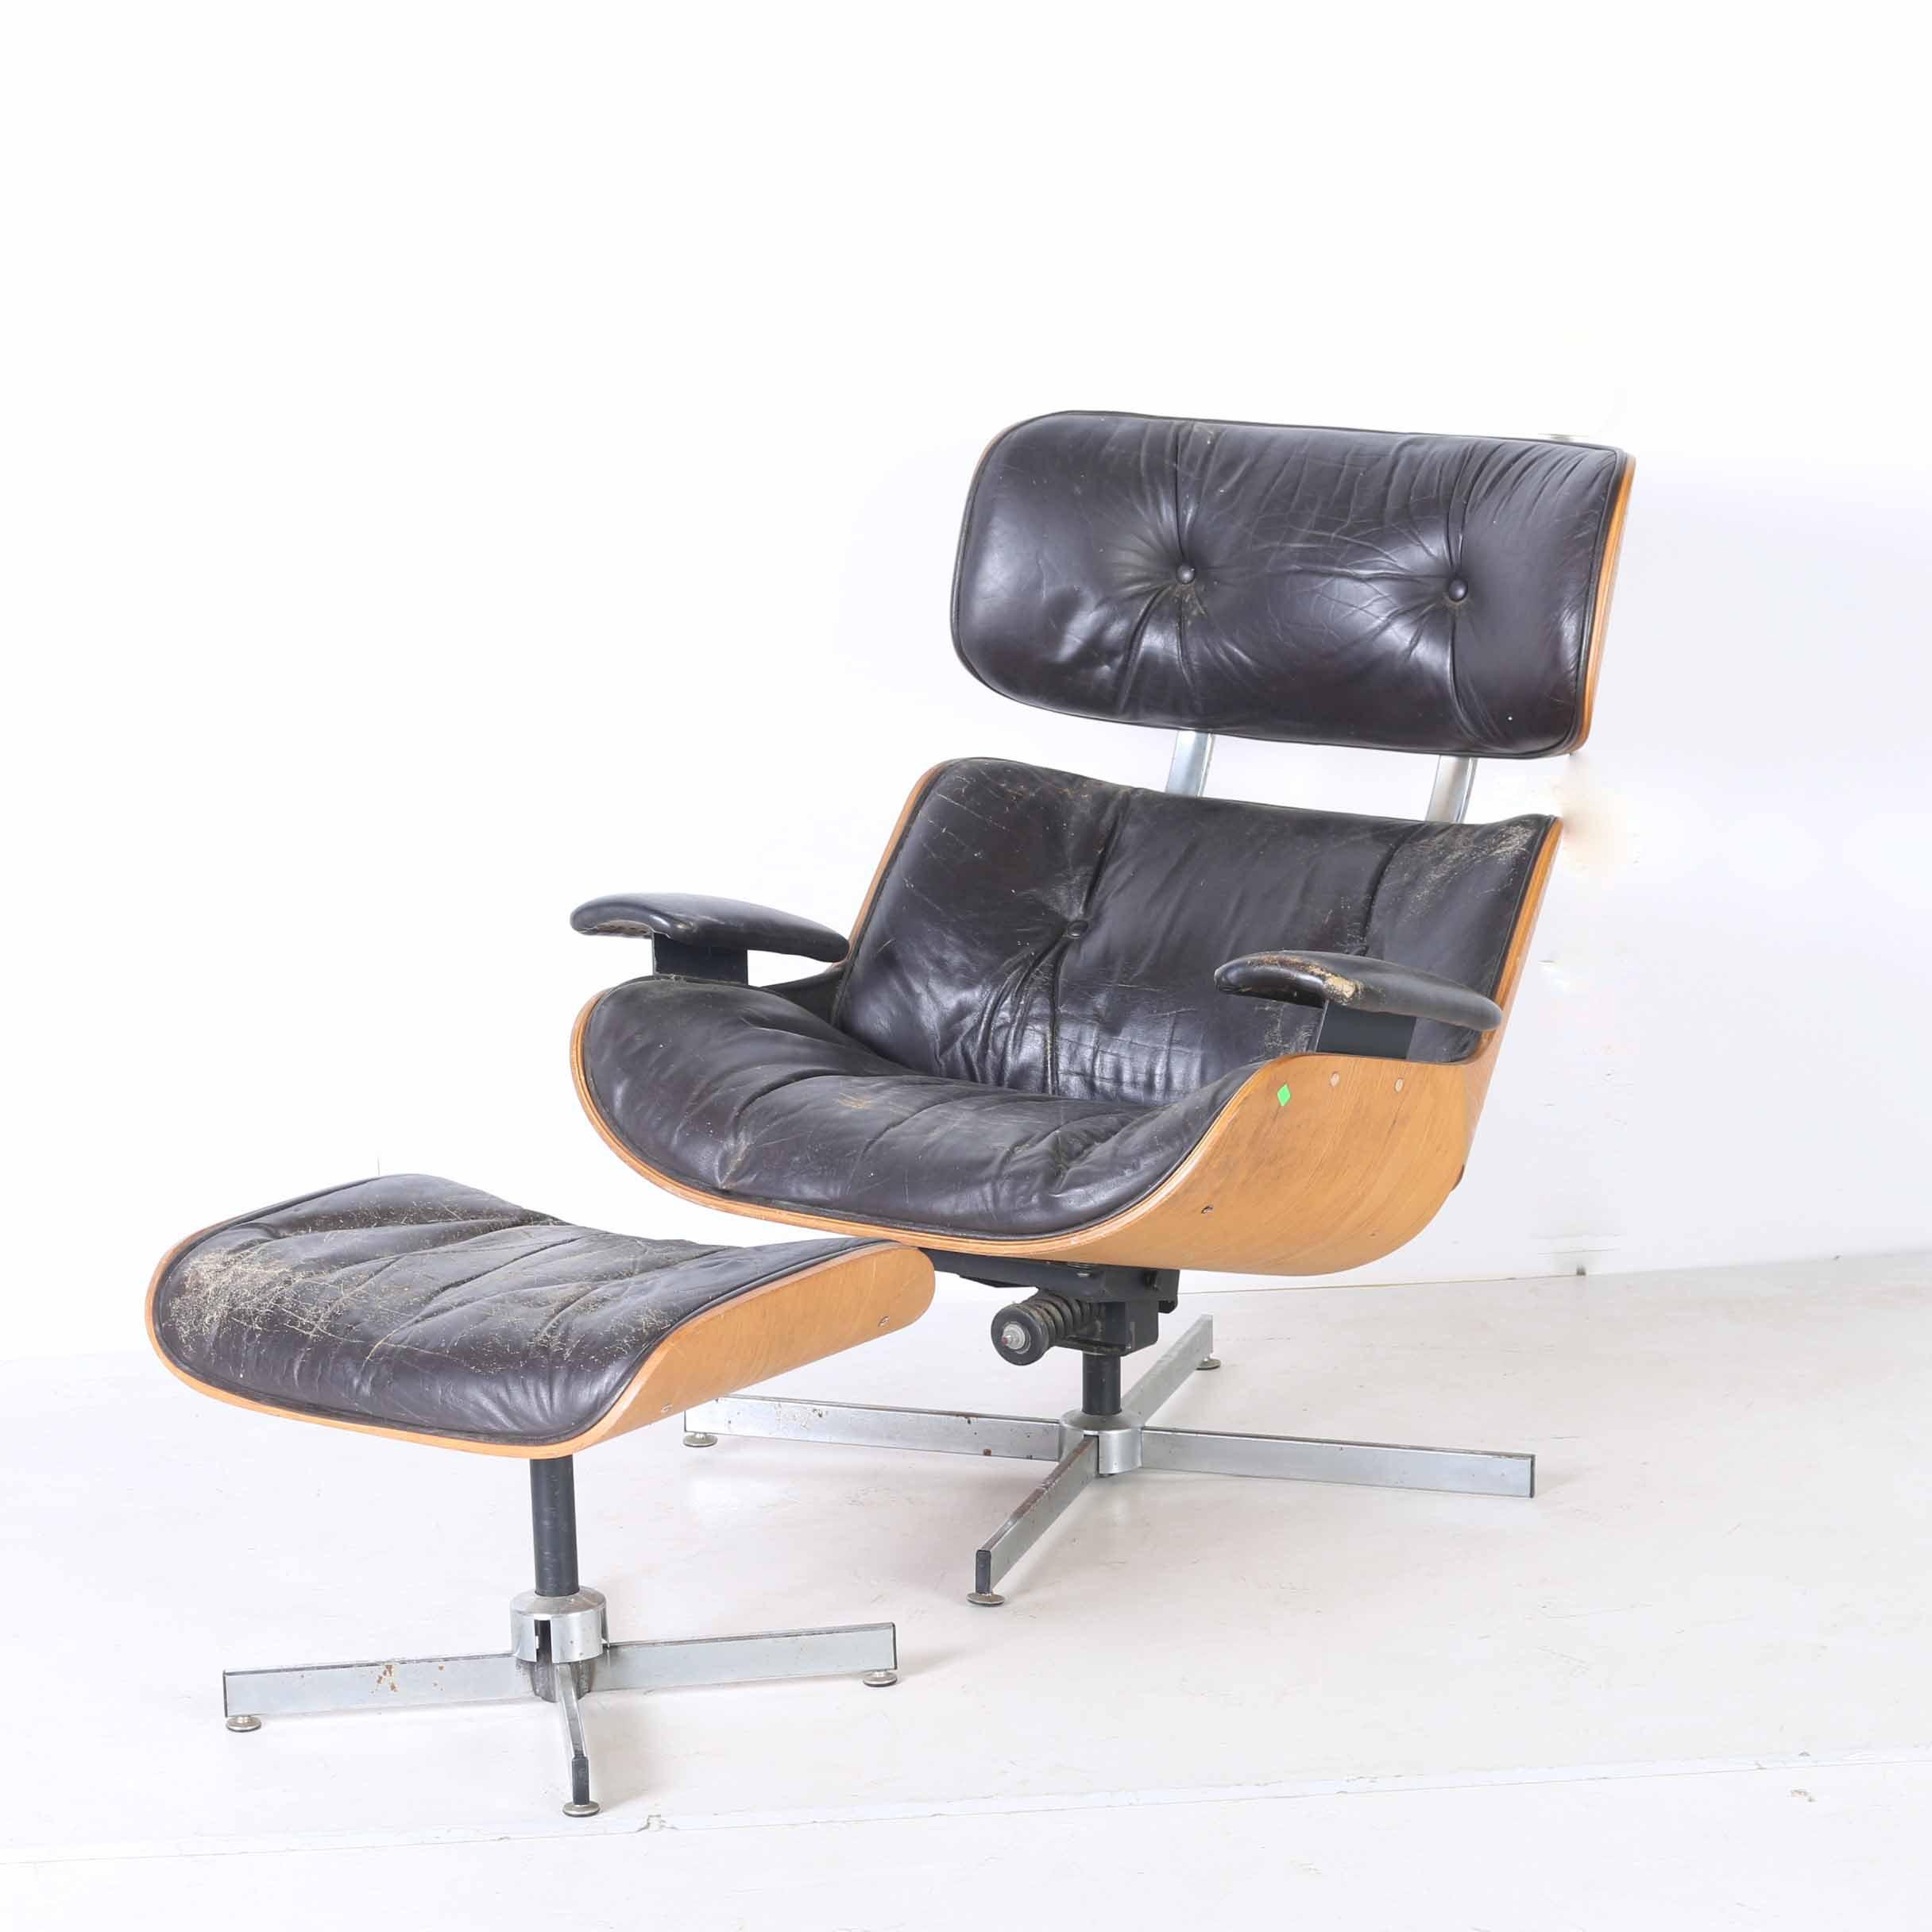 Mid Century Modern Lounge Chair with Ottoman EBTH